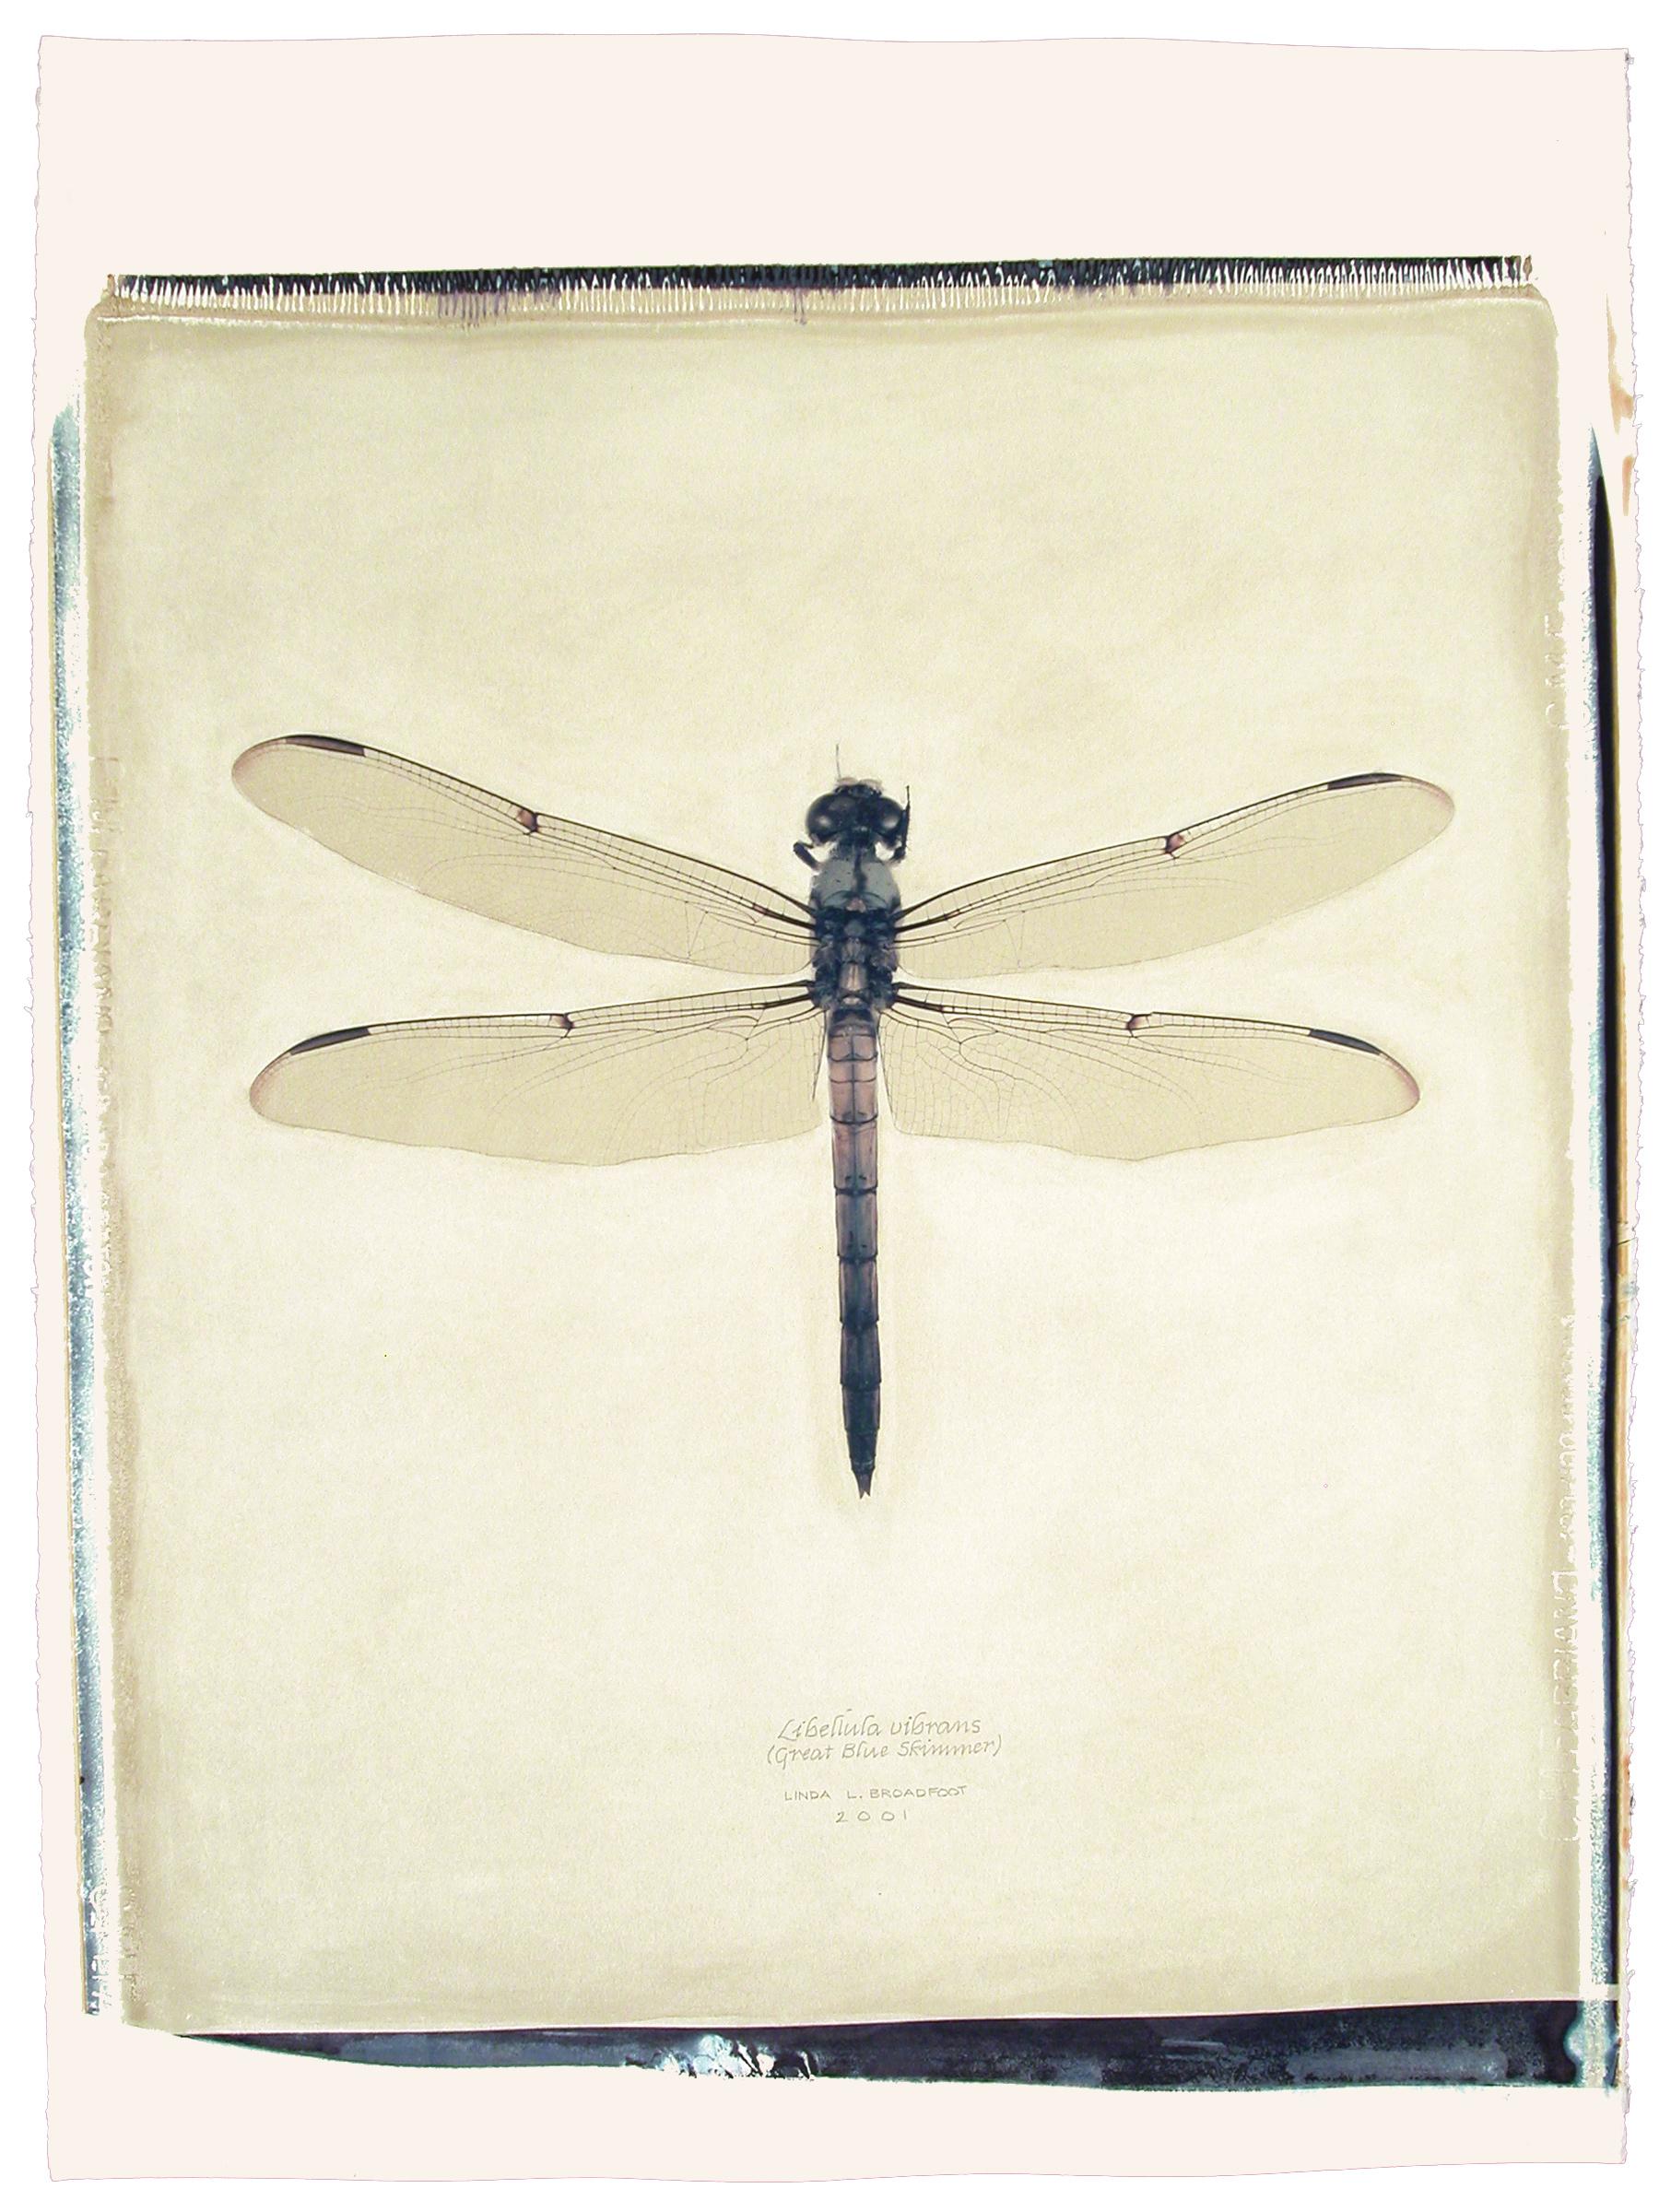 Libellula vibrans  (Great Blue Skimmer), 2001